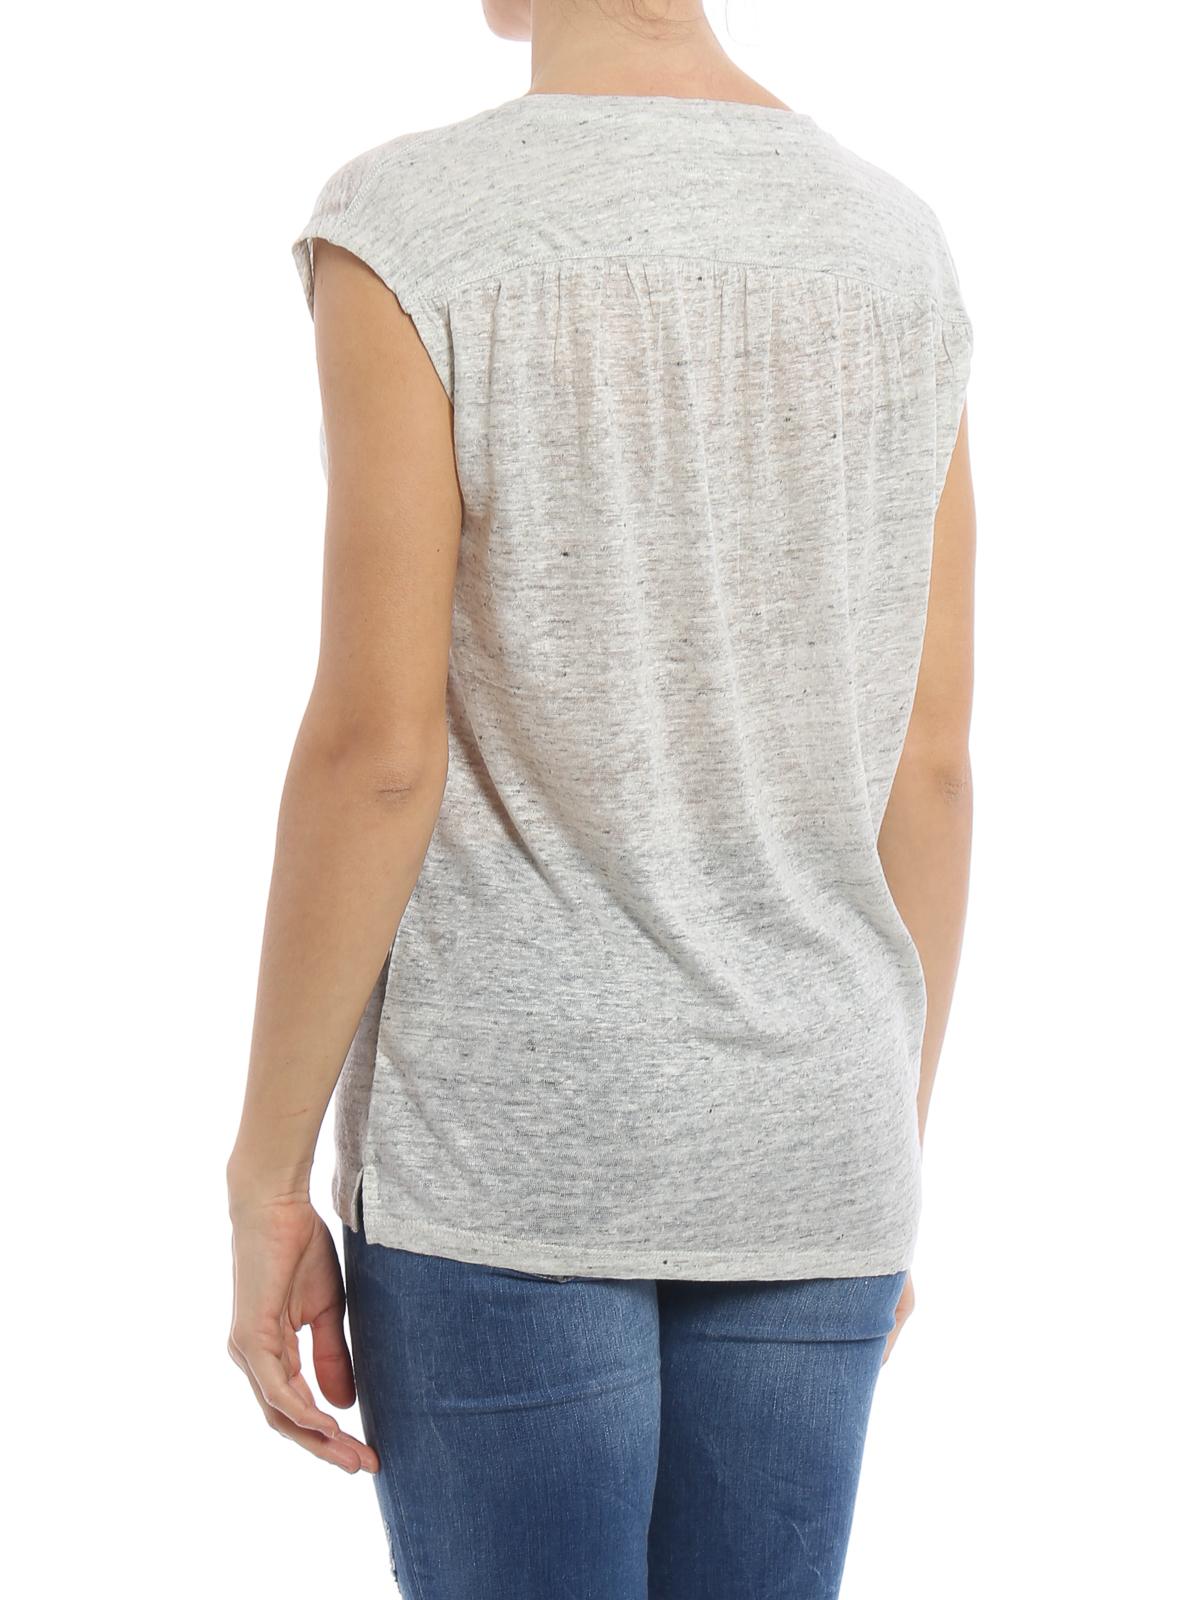 CAMISETAS Y TOPS - Camisetas Majestic Filatures 35fvlNlmp